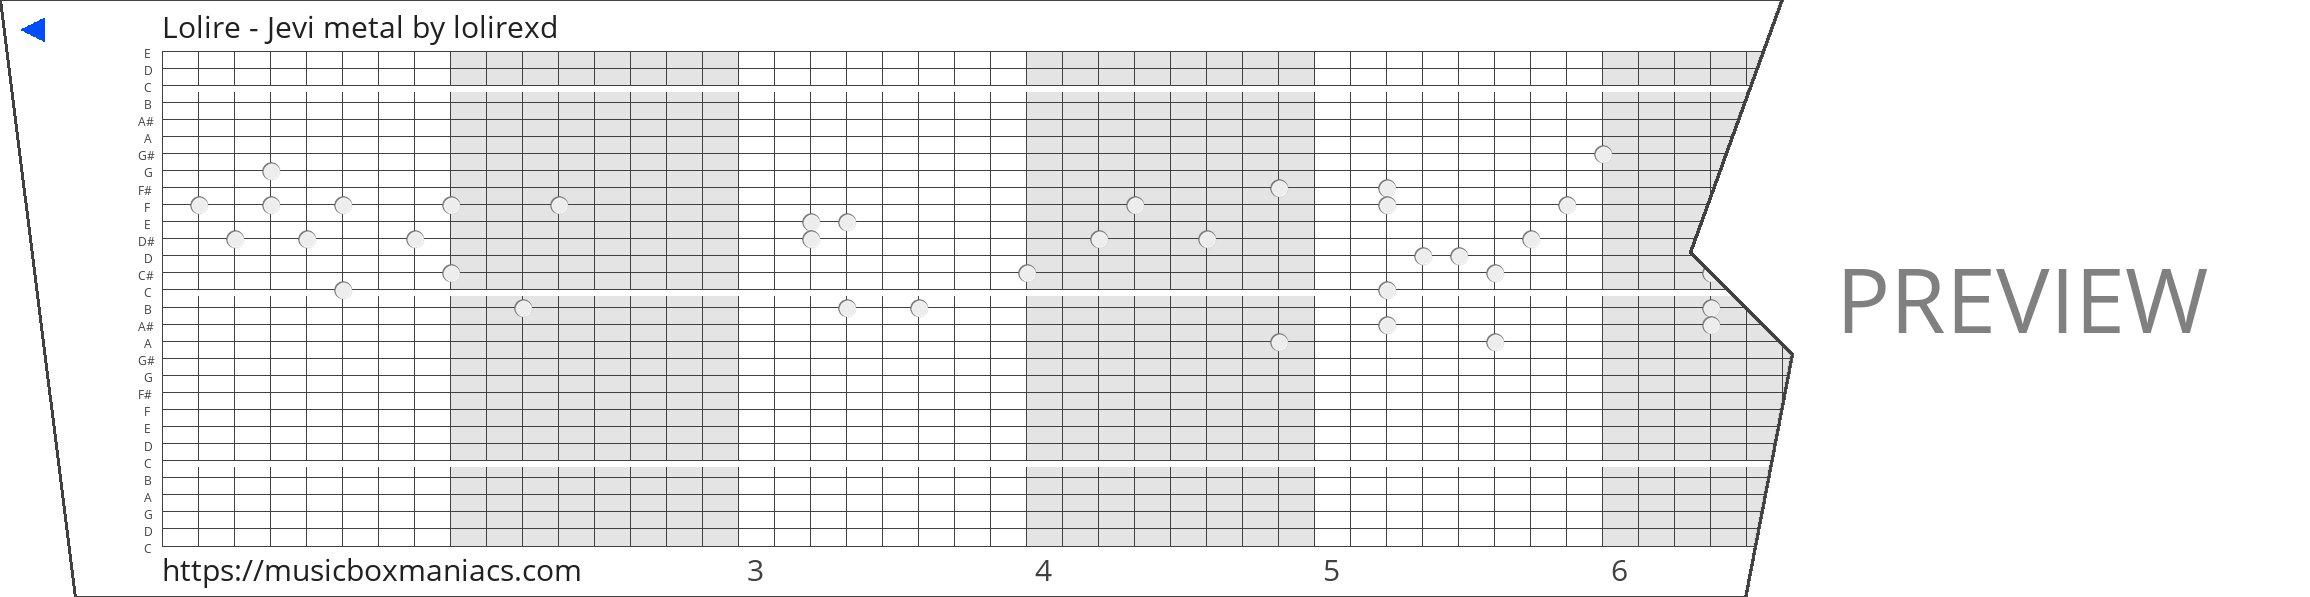 Lolire - Jevi metal 30 note music box paper strip